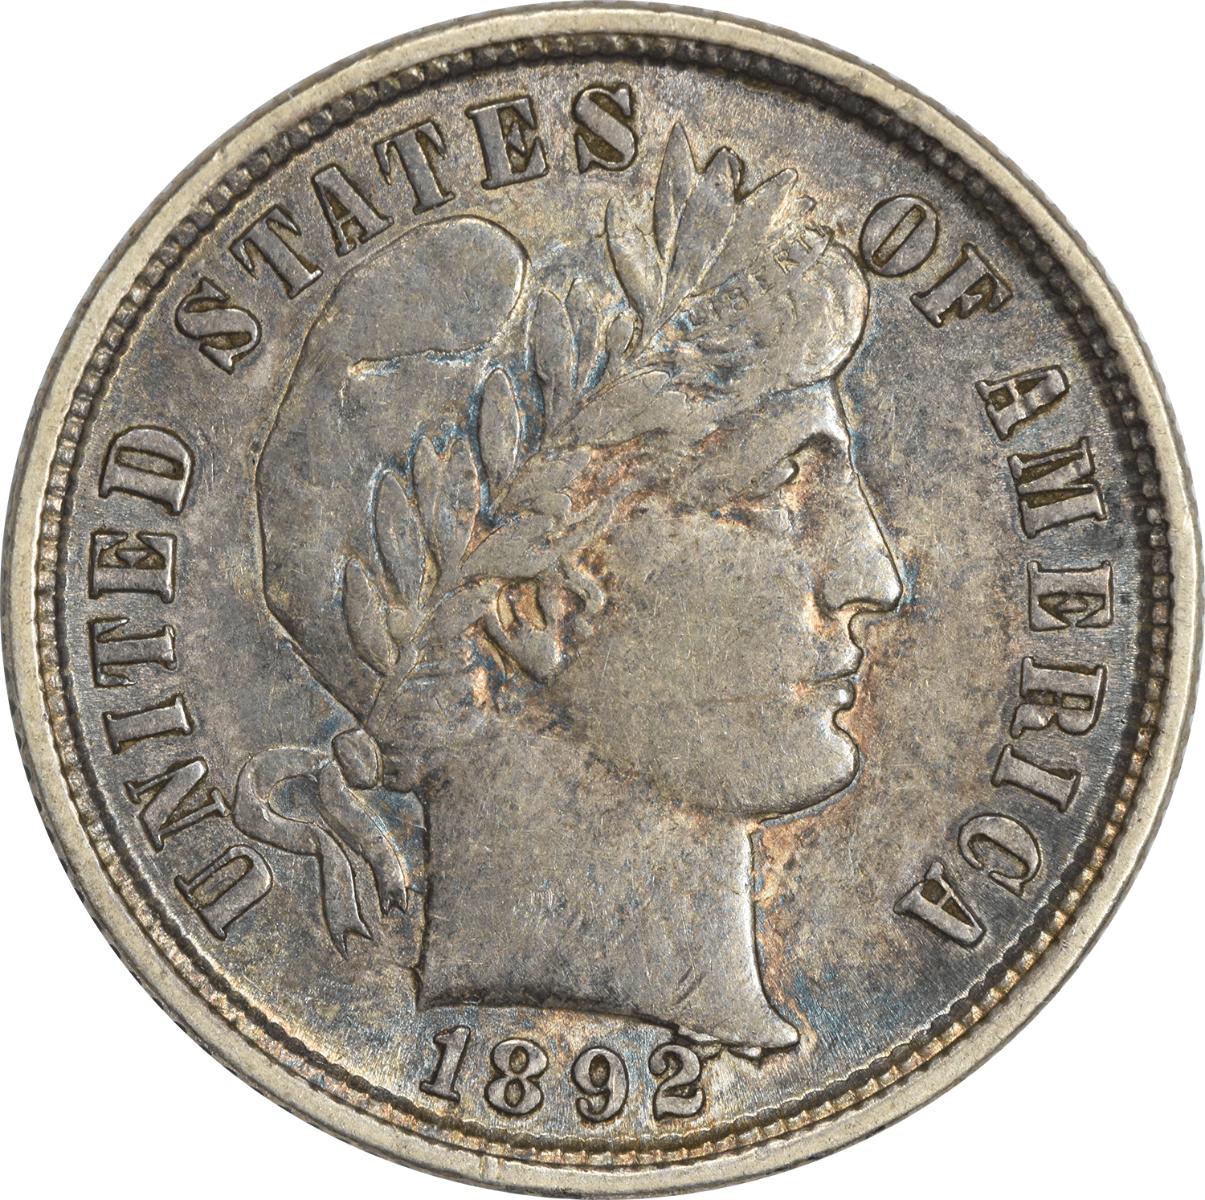 1892 Barber Silver Dime, AU, Uncertified